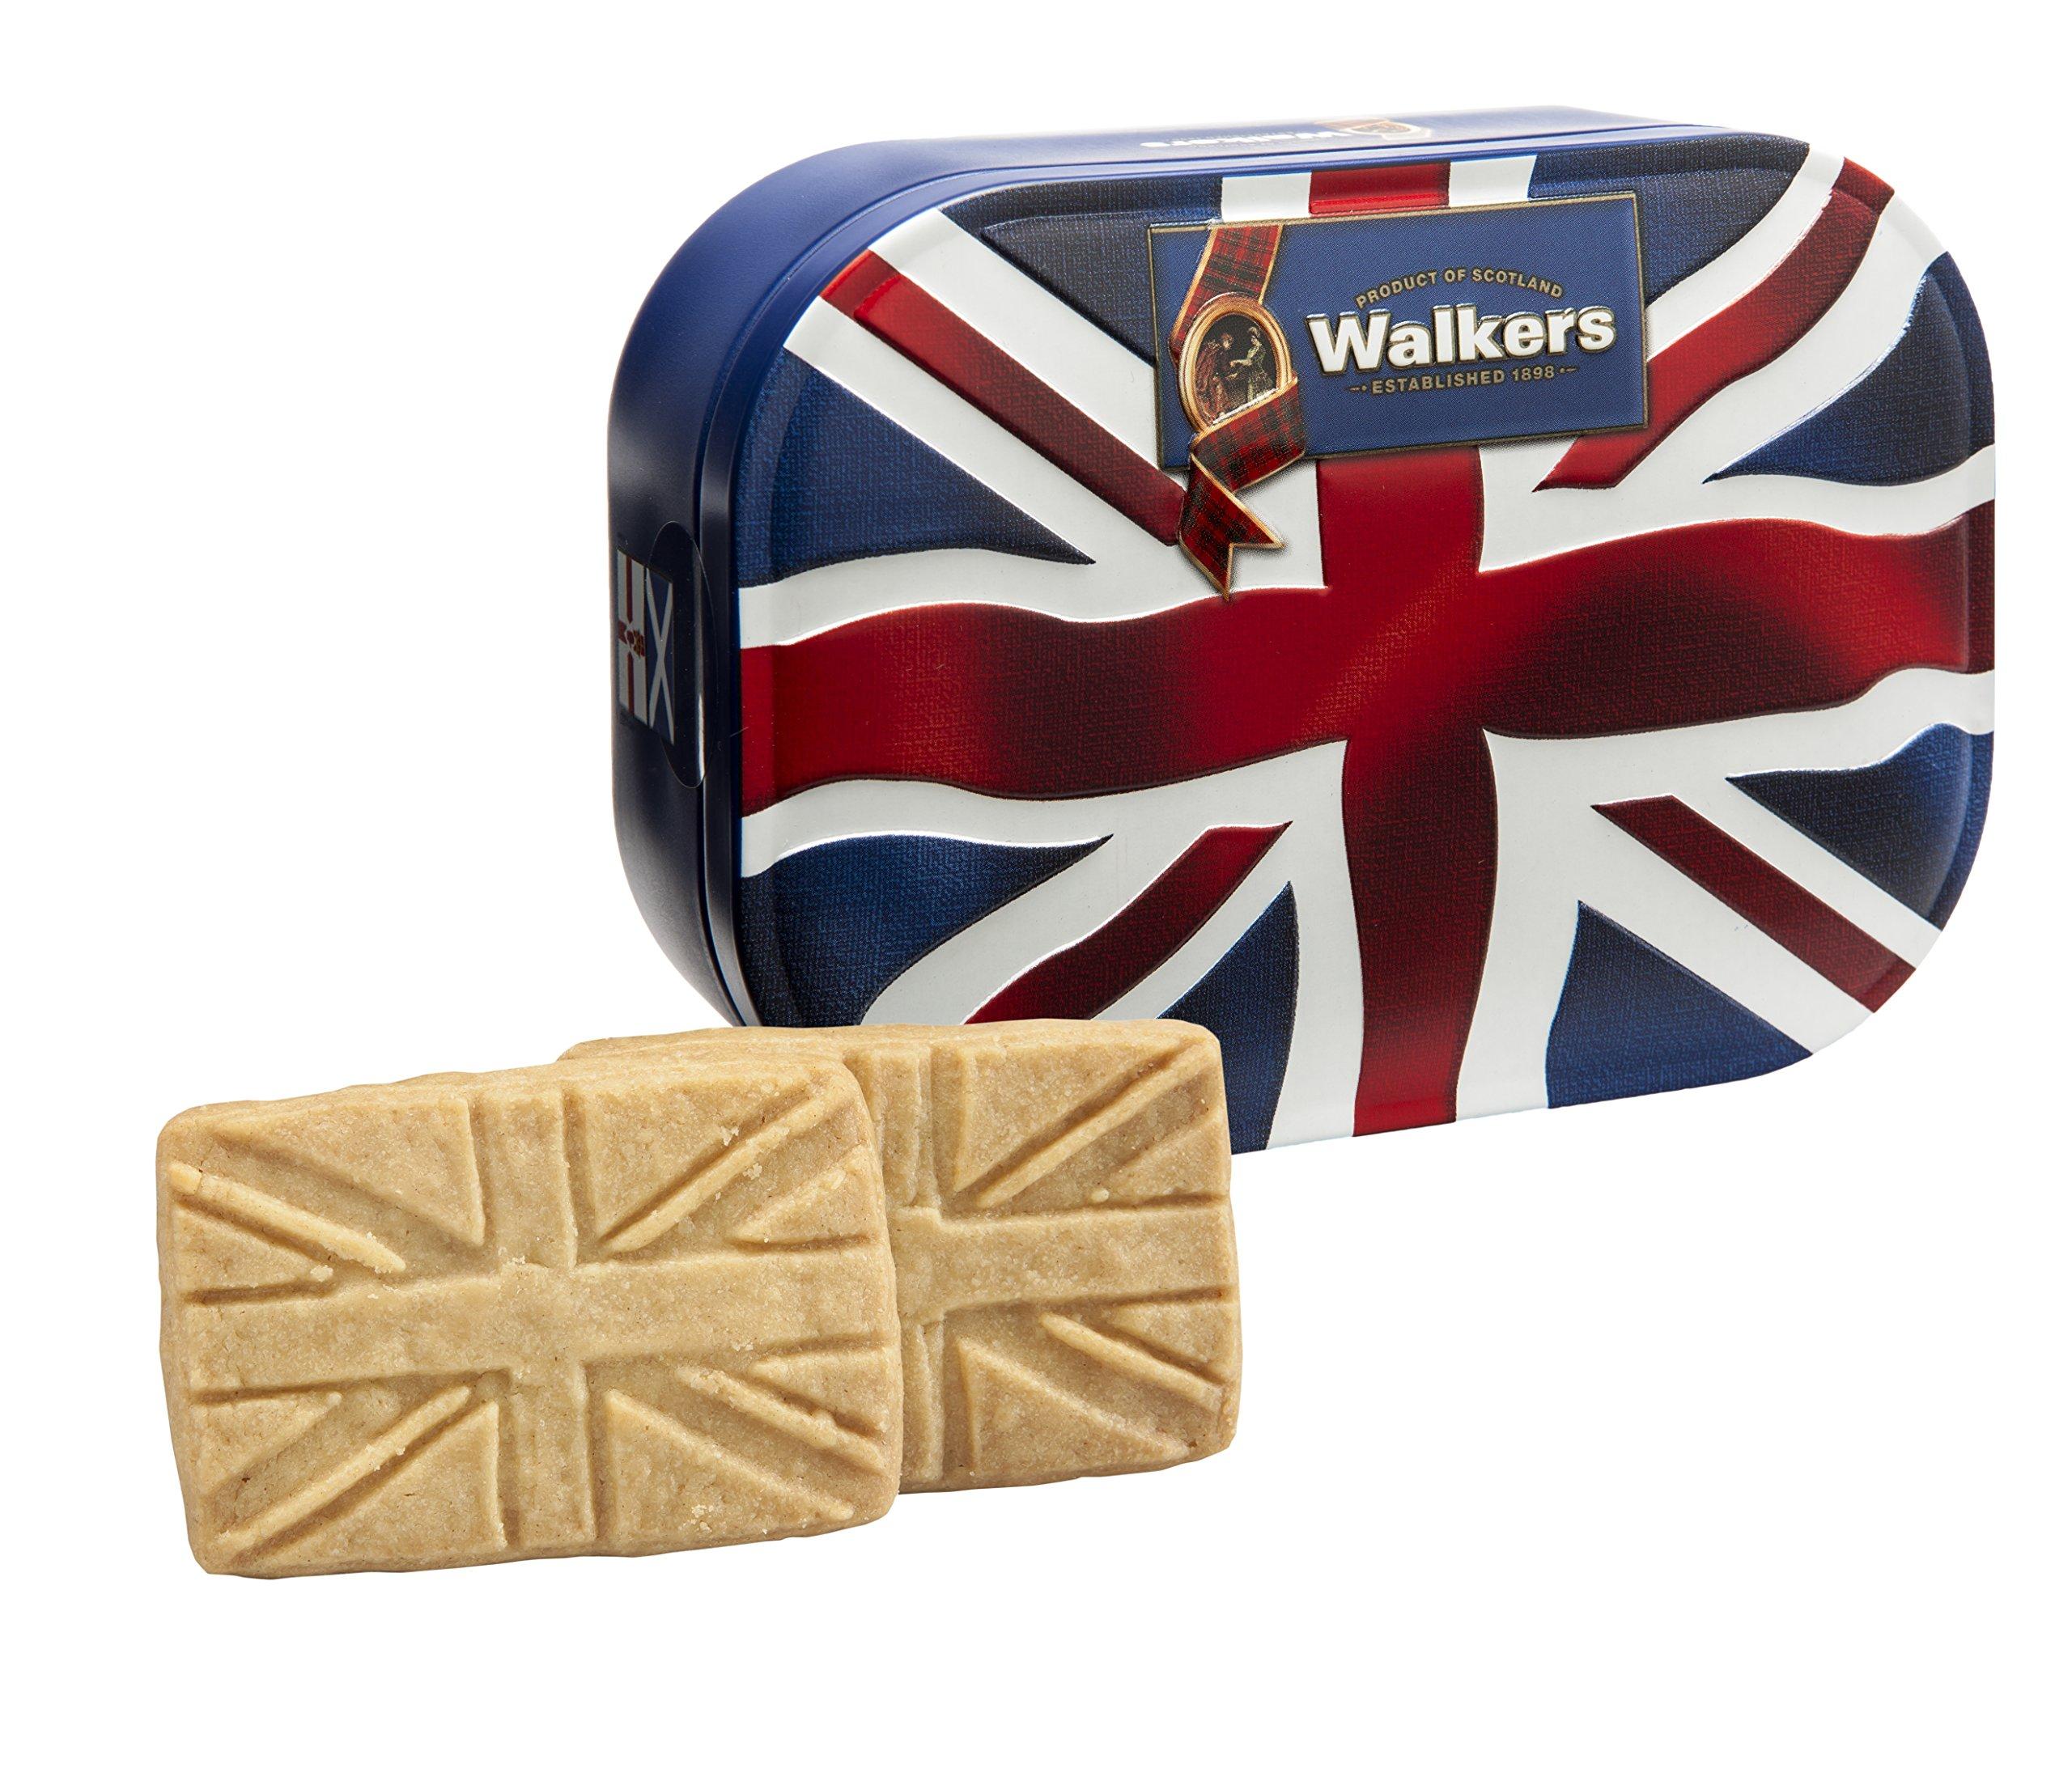 Walkers Union Jack Pure Butter Shortbread Tin